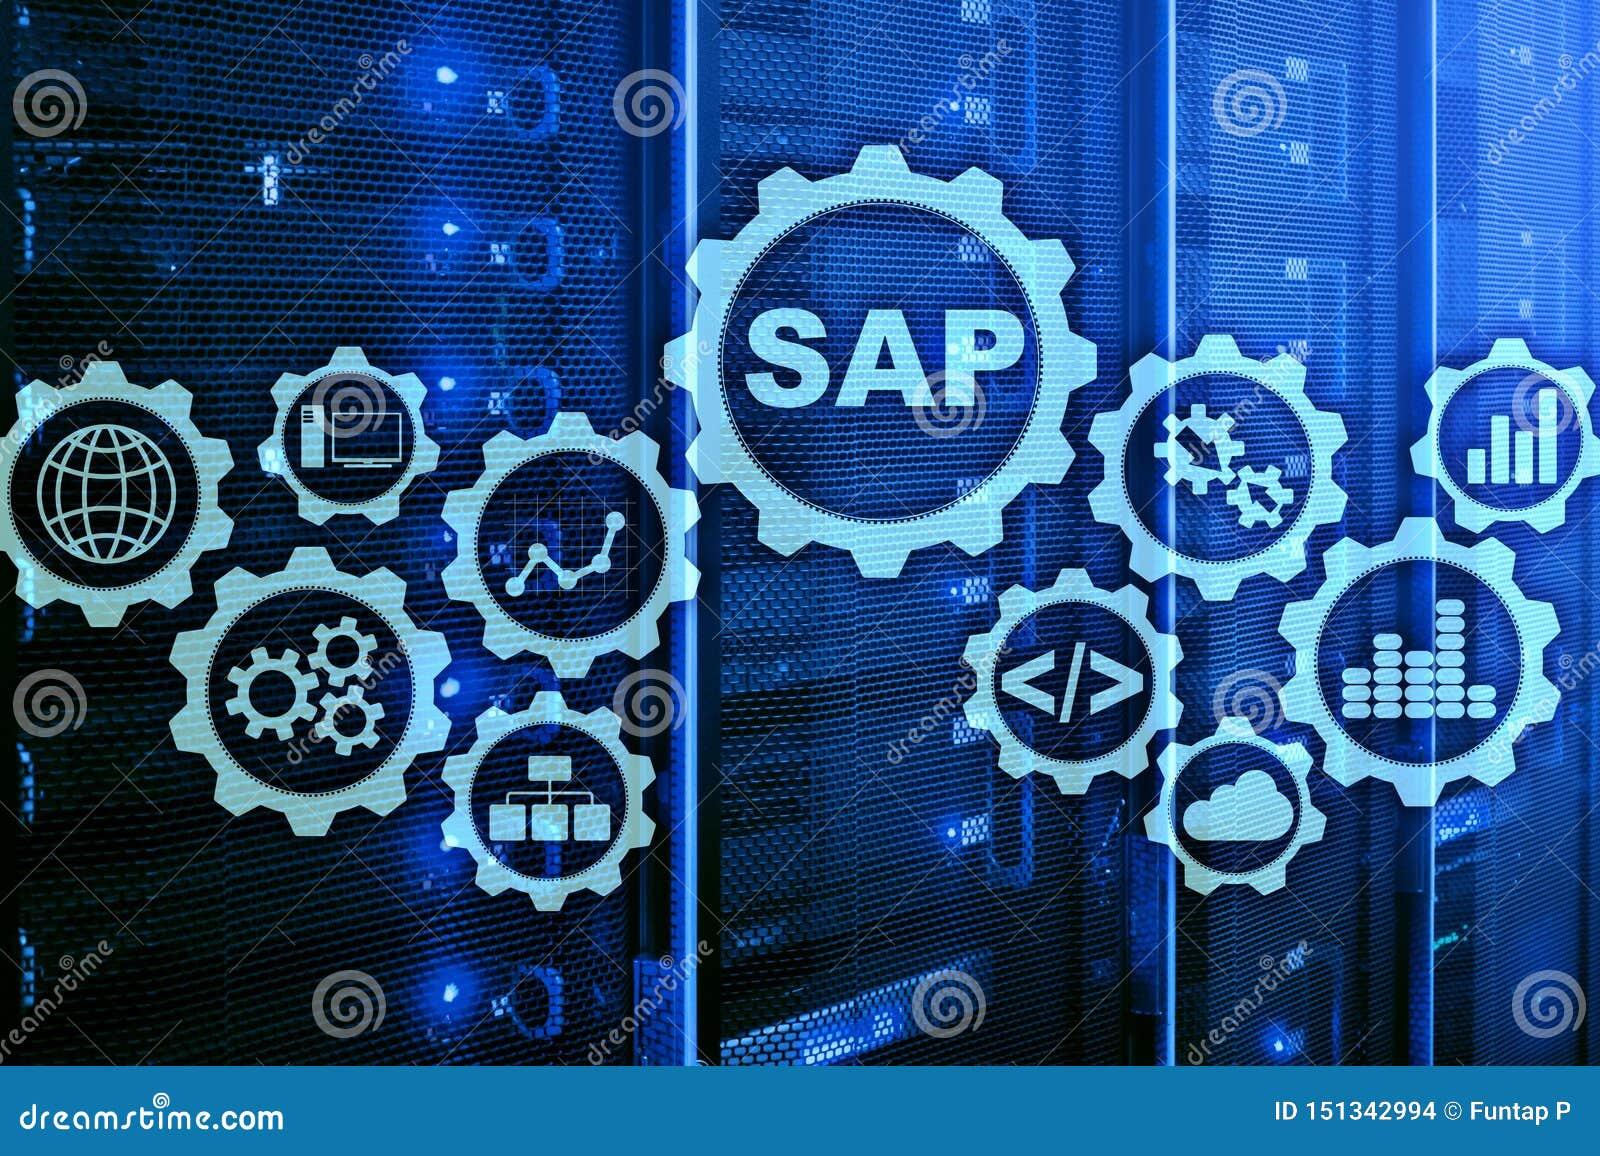 Sap System Software Automation Concept On Virtual Screen Data Center Stock Illustration Illustration Of Development Application 151342994